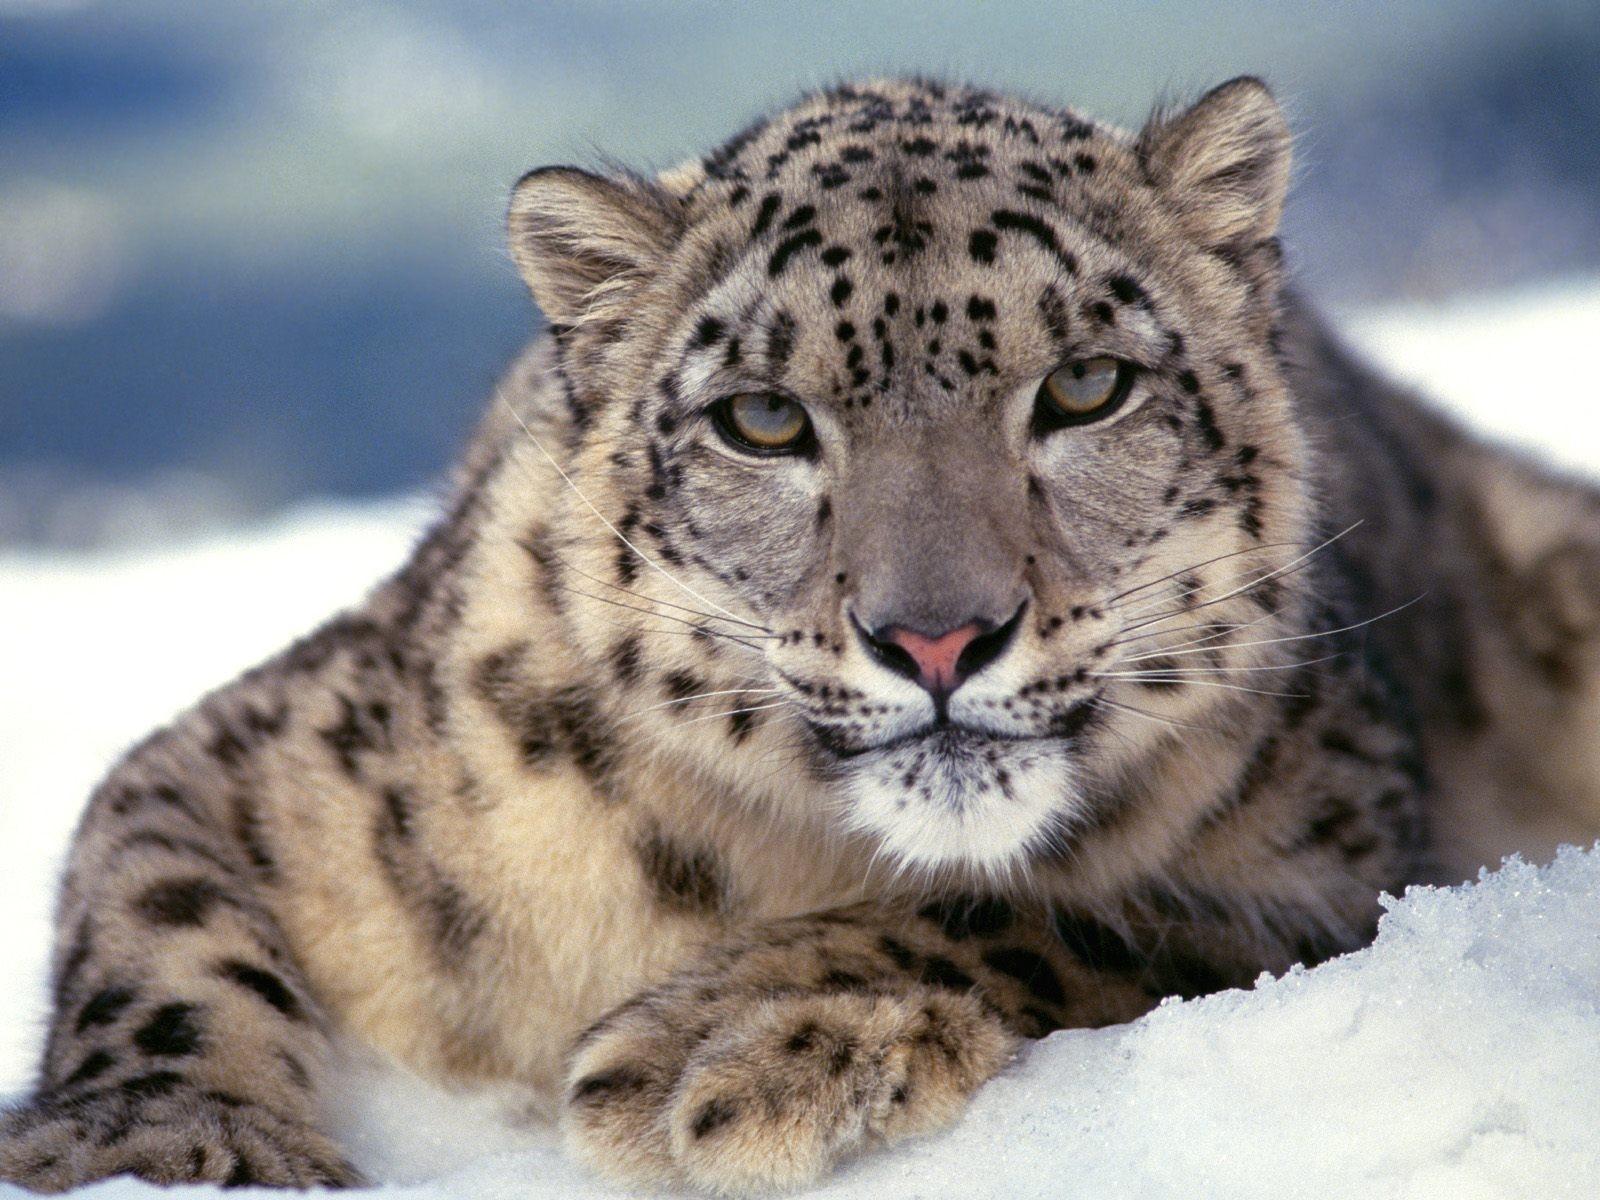 http://img.desktopwallpapers.ru/animals/pics/irbis-1600.jpg